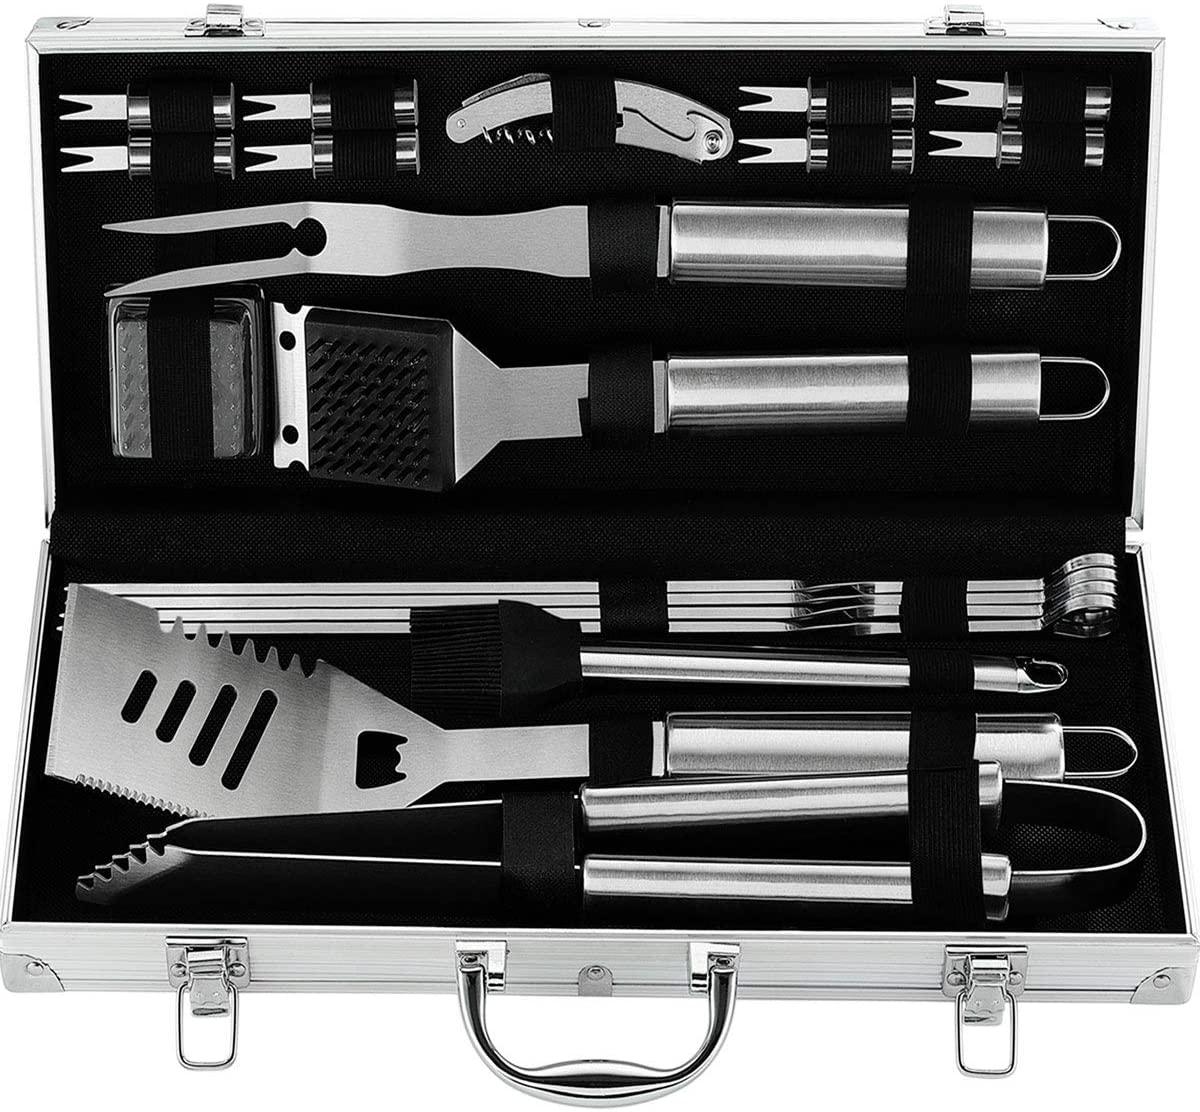 attache full of silver barbecue tools